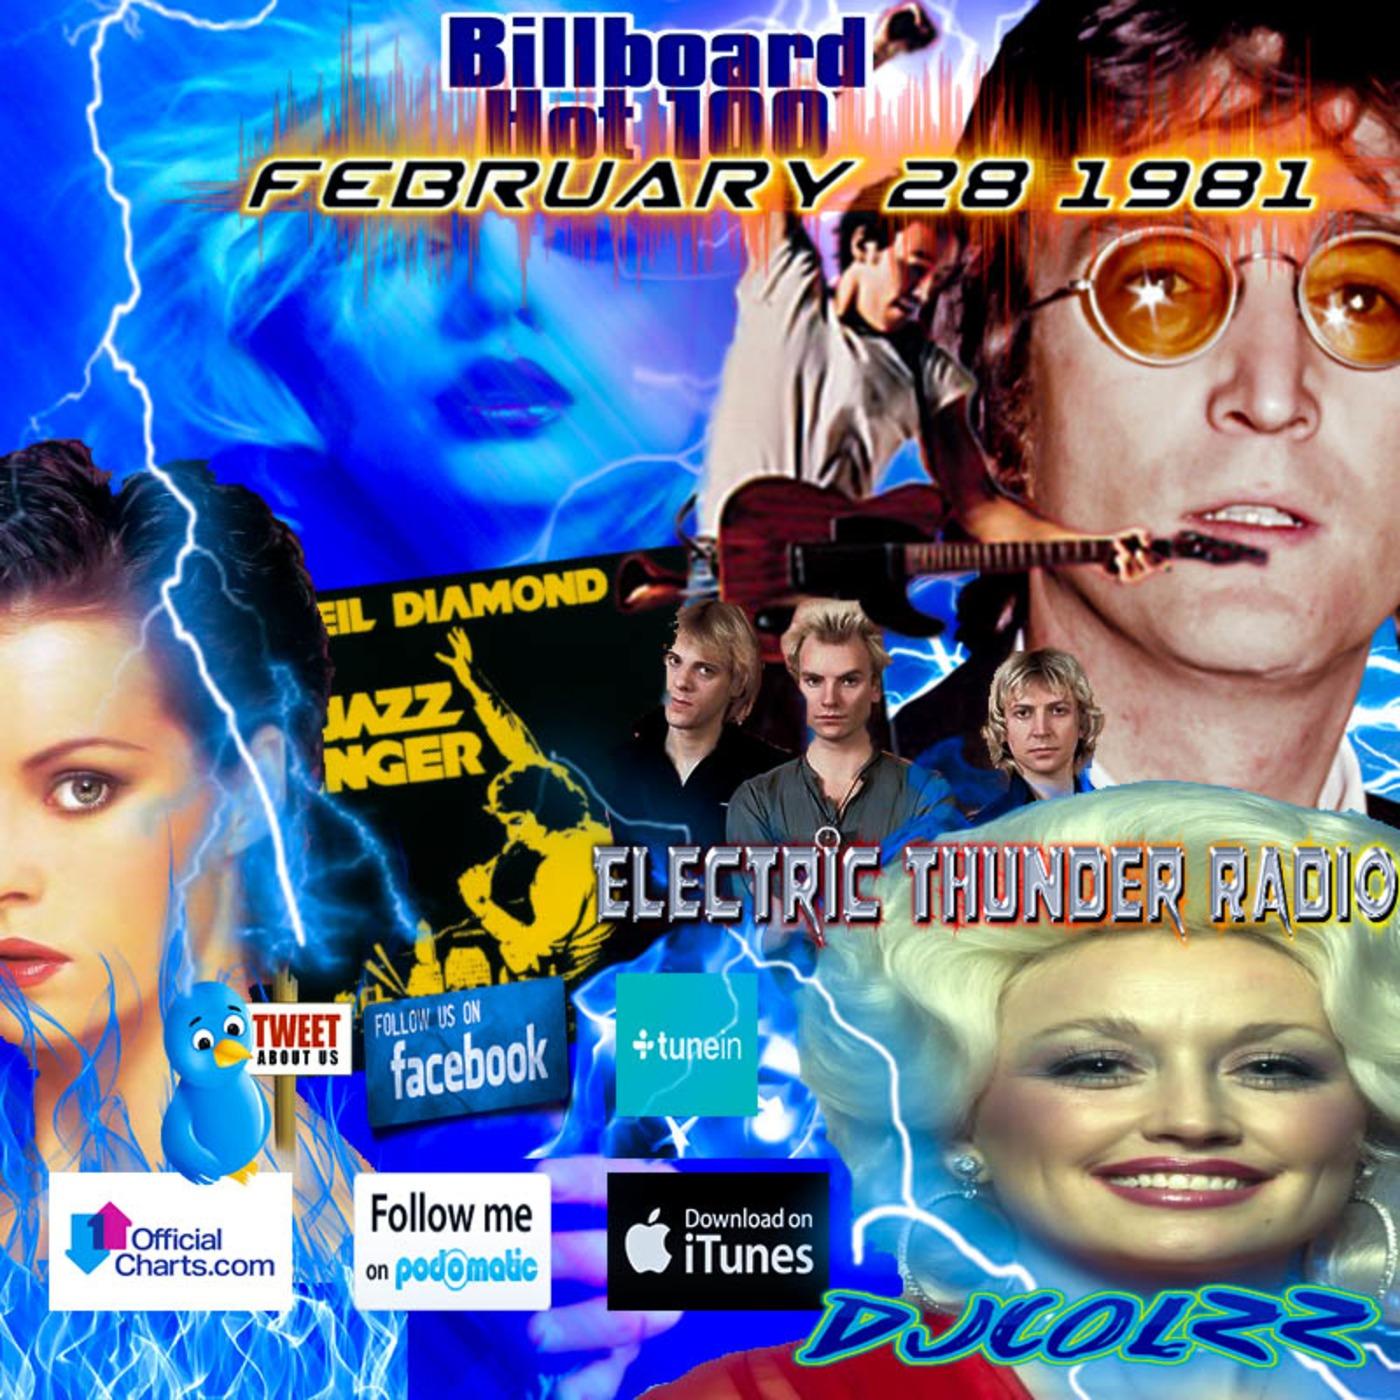 Billboard Hot 100 February 28 1981 Electric Thunder Radio